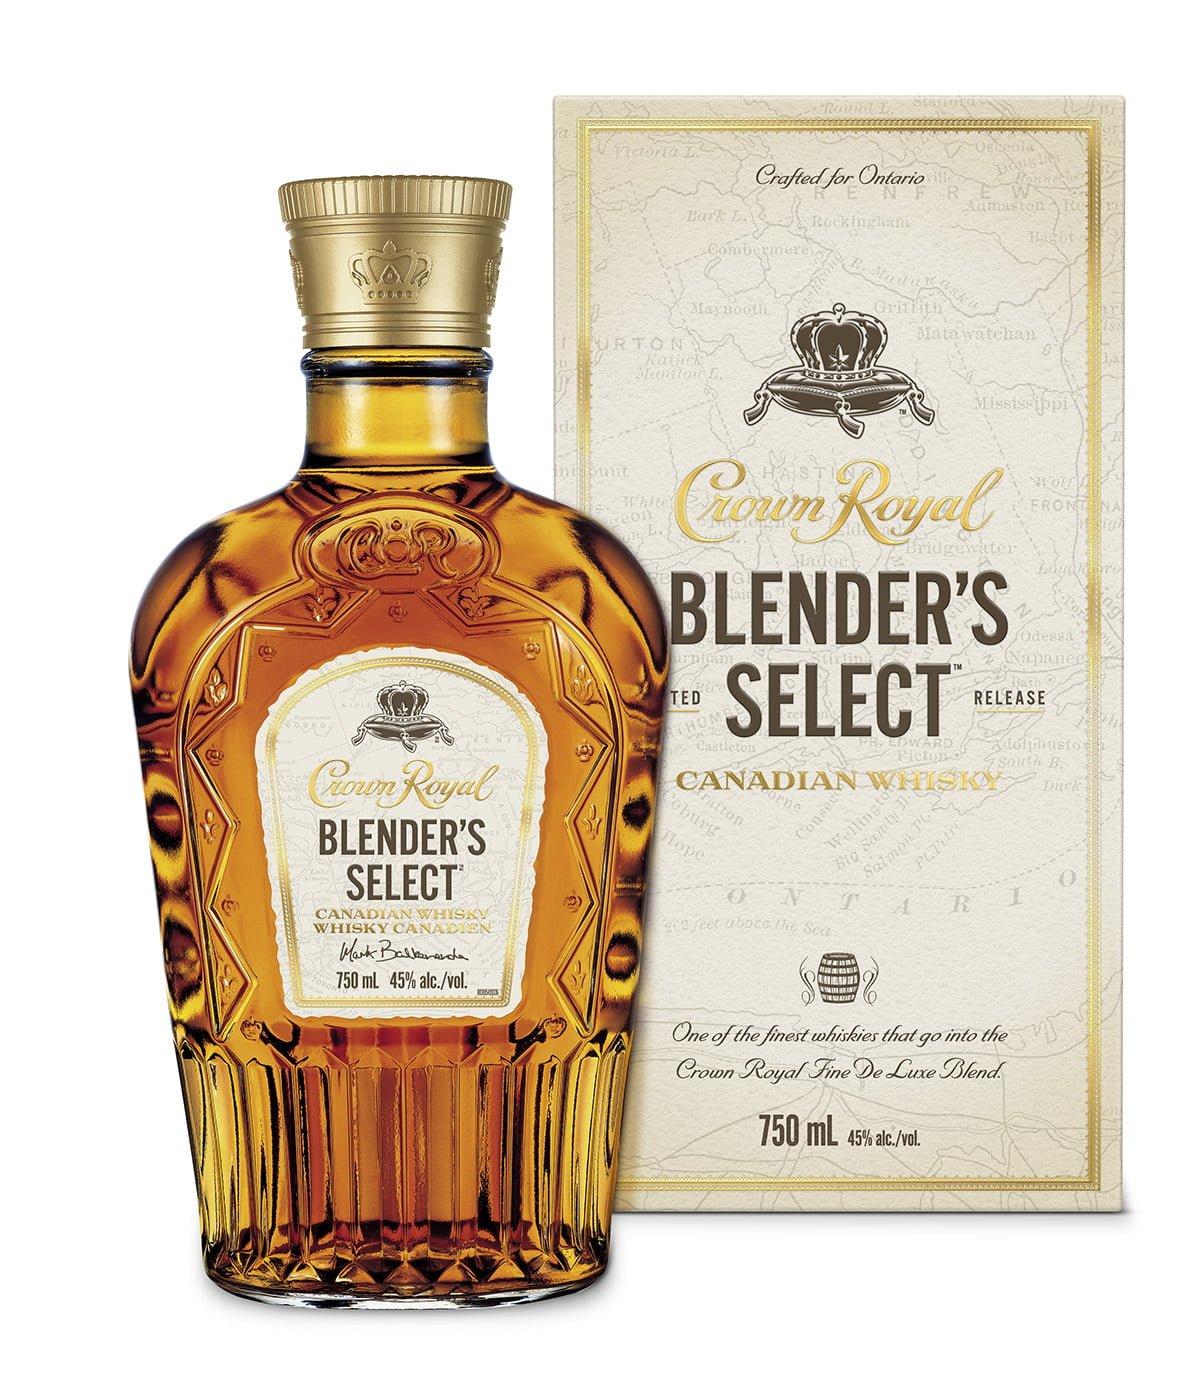 Crown Royal Blender's Select